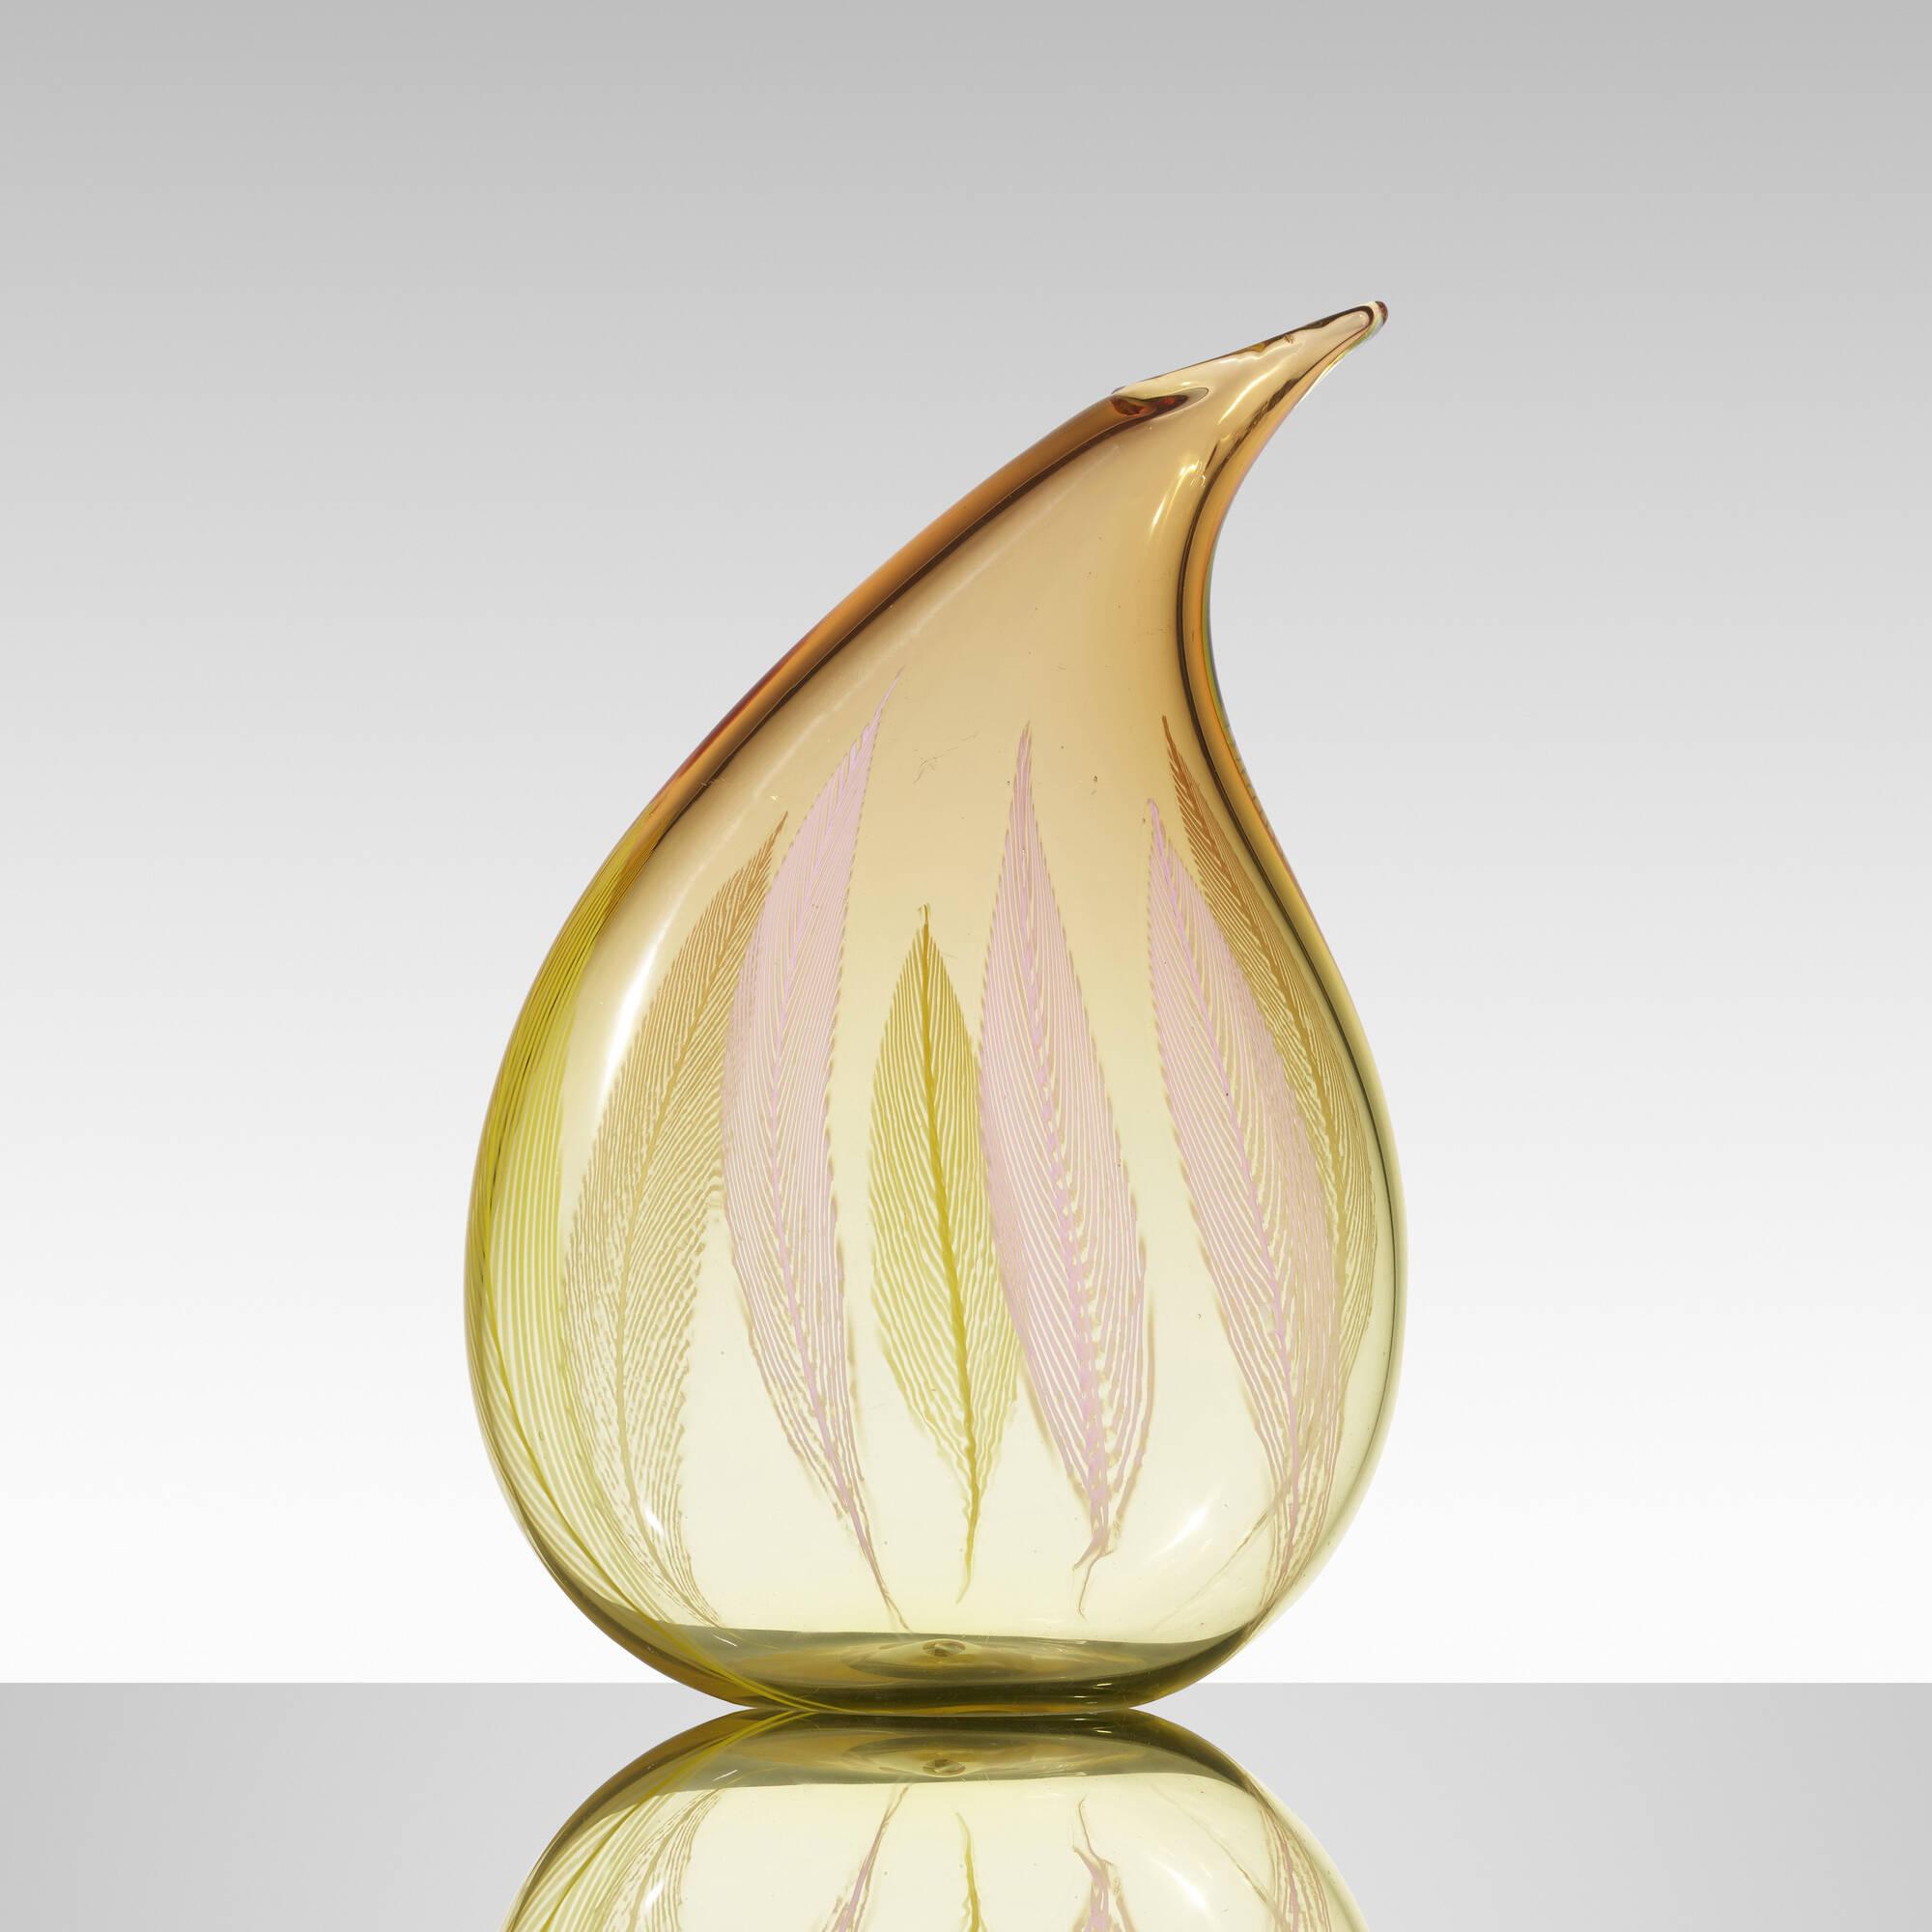 168: Archimede Seguso / A Piume vase (2 of 3)